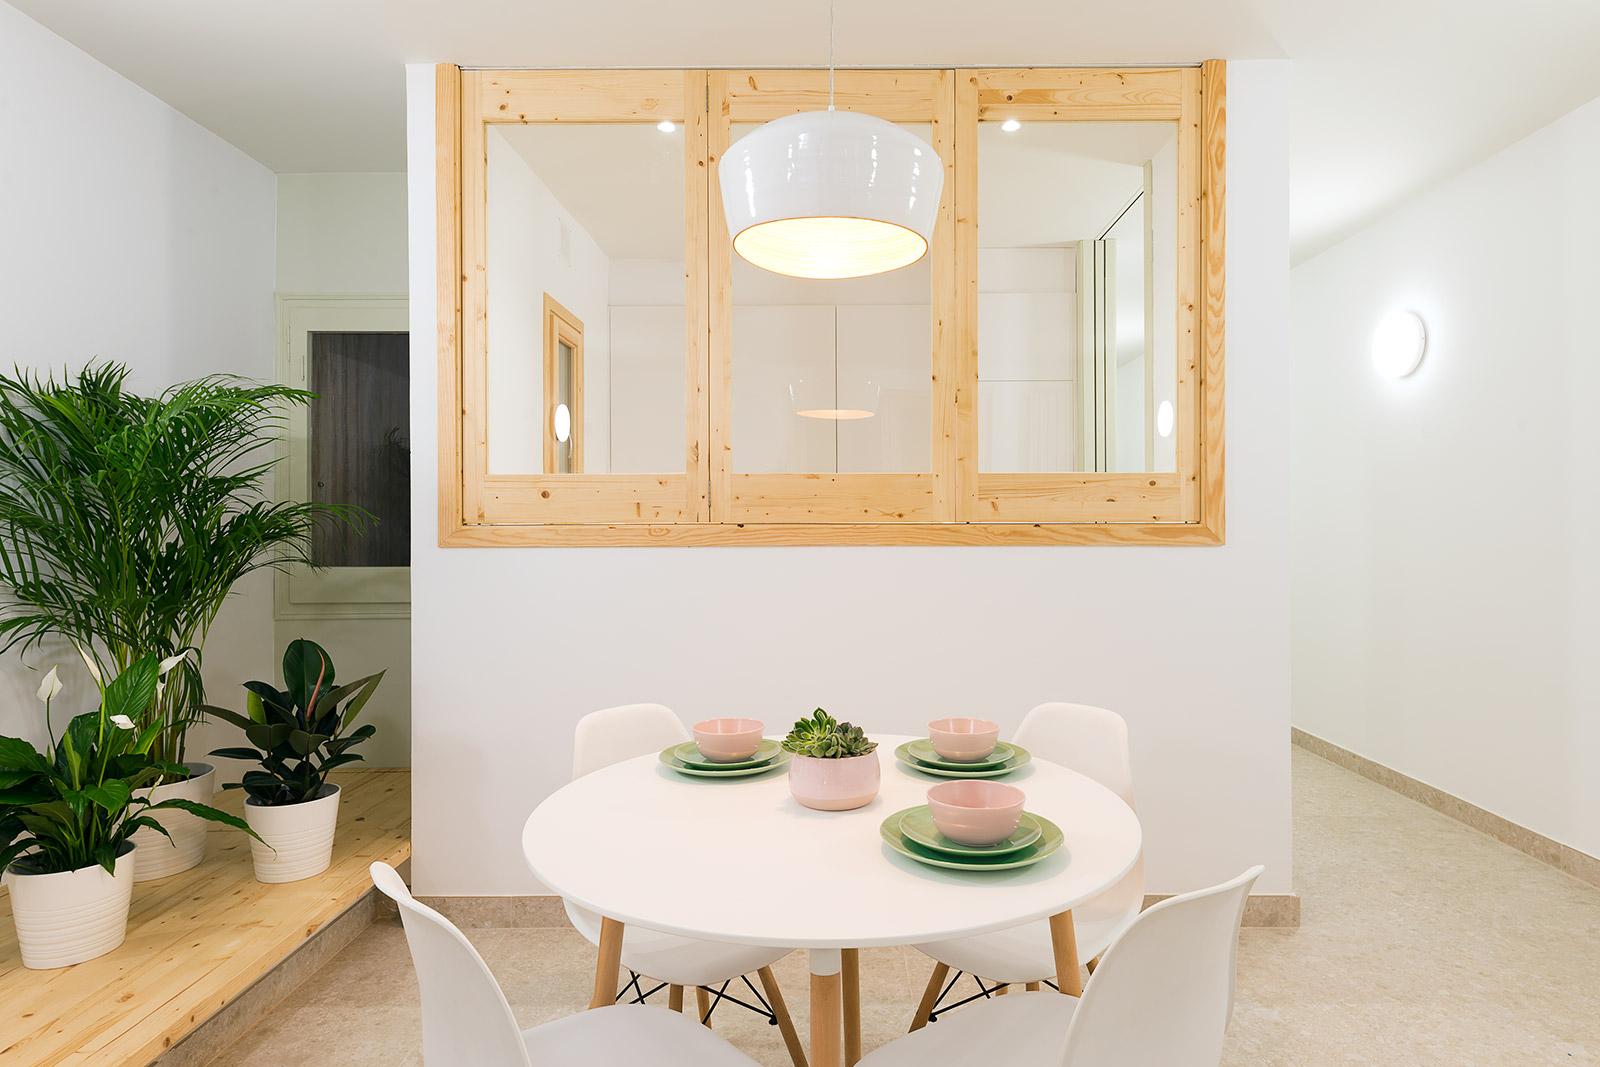 ffwd-arquitectes-david-benito-cortazar (9)